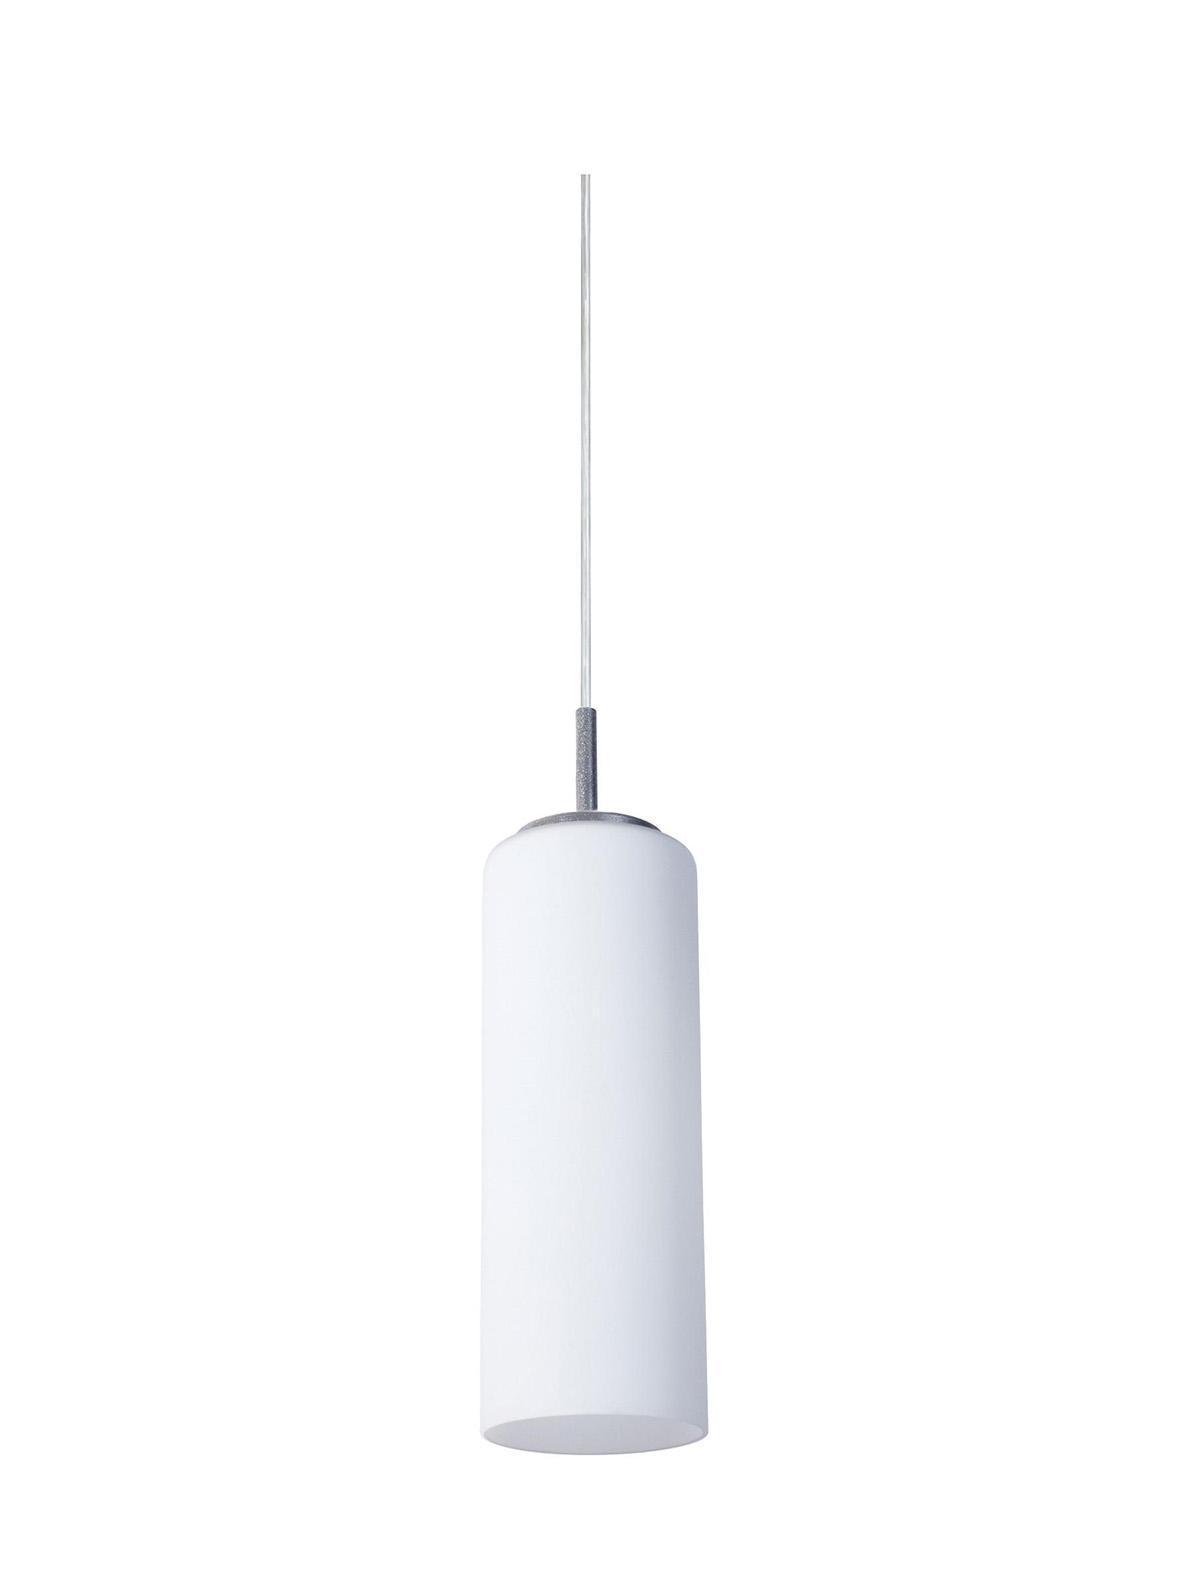 Светильник подвесной Arte lamp A6710sp-1wh 100% new original oem bare lamp bulb sp lamp 085 for infocus in8606hd projectors